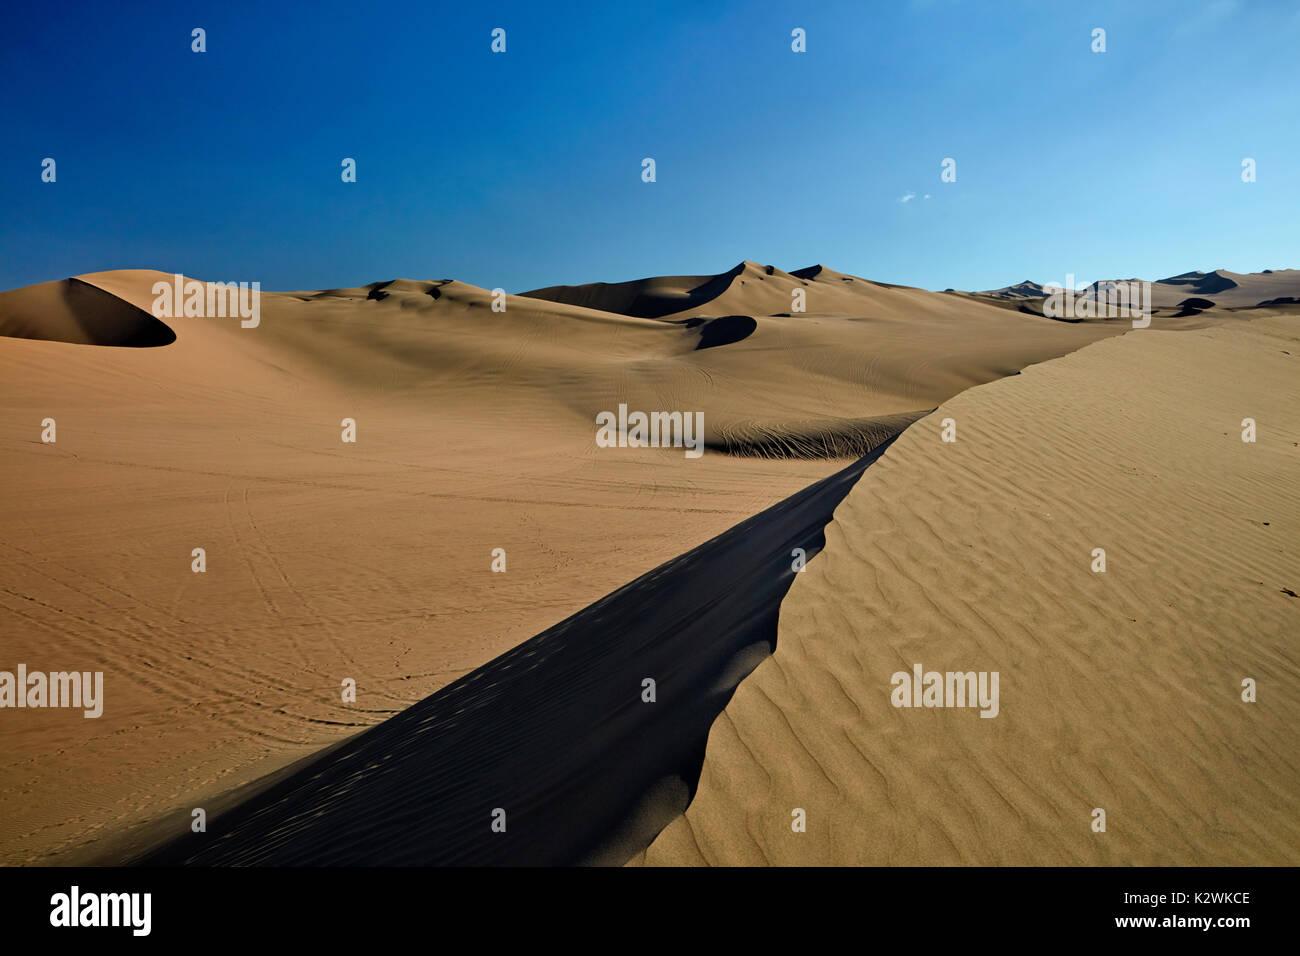 Sand dunes in desert near Huacachina Oasis, Ica, Peru, South America - Stock Image